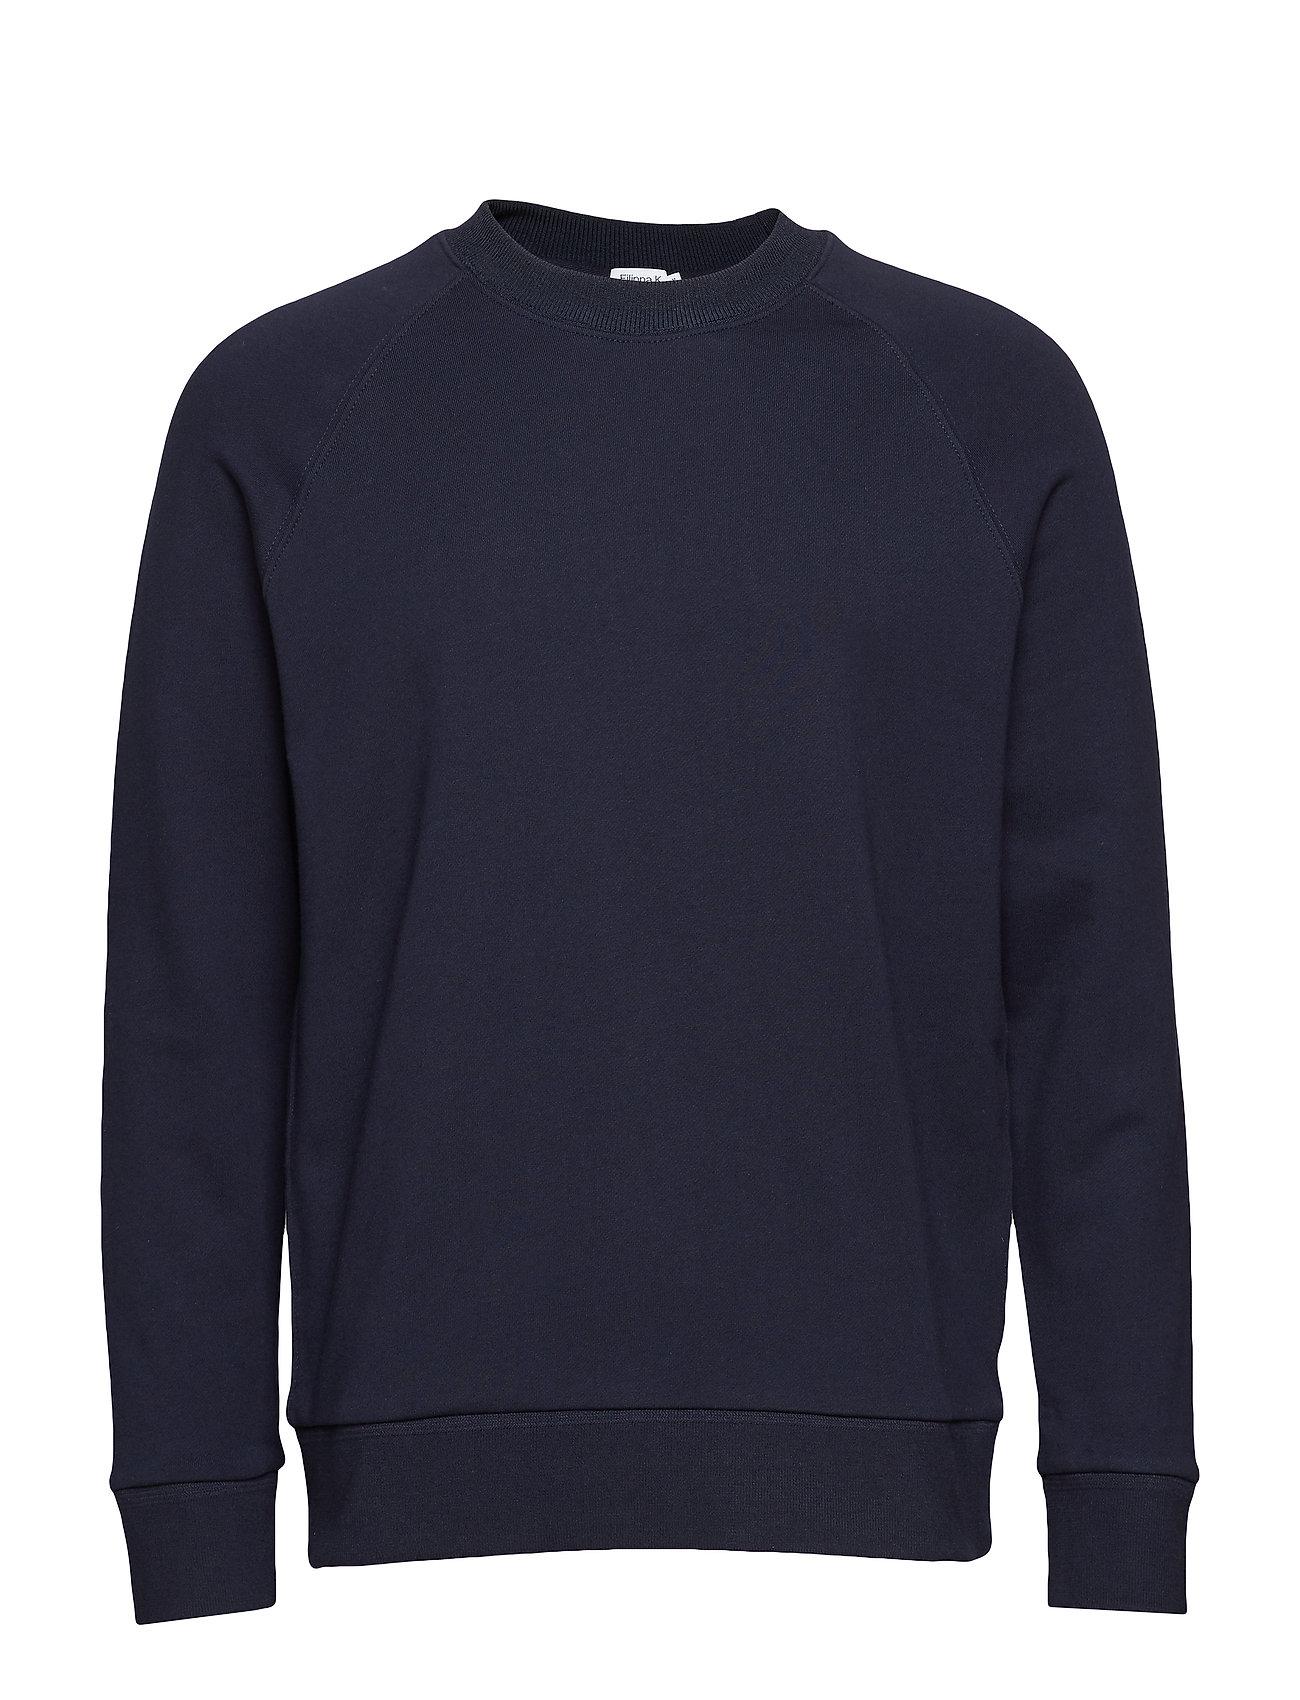 Filippa K M. Tuxedo Sweatshirt - NAVY